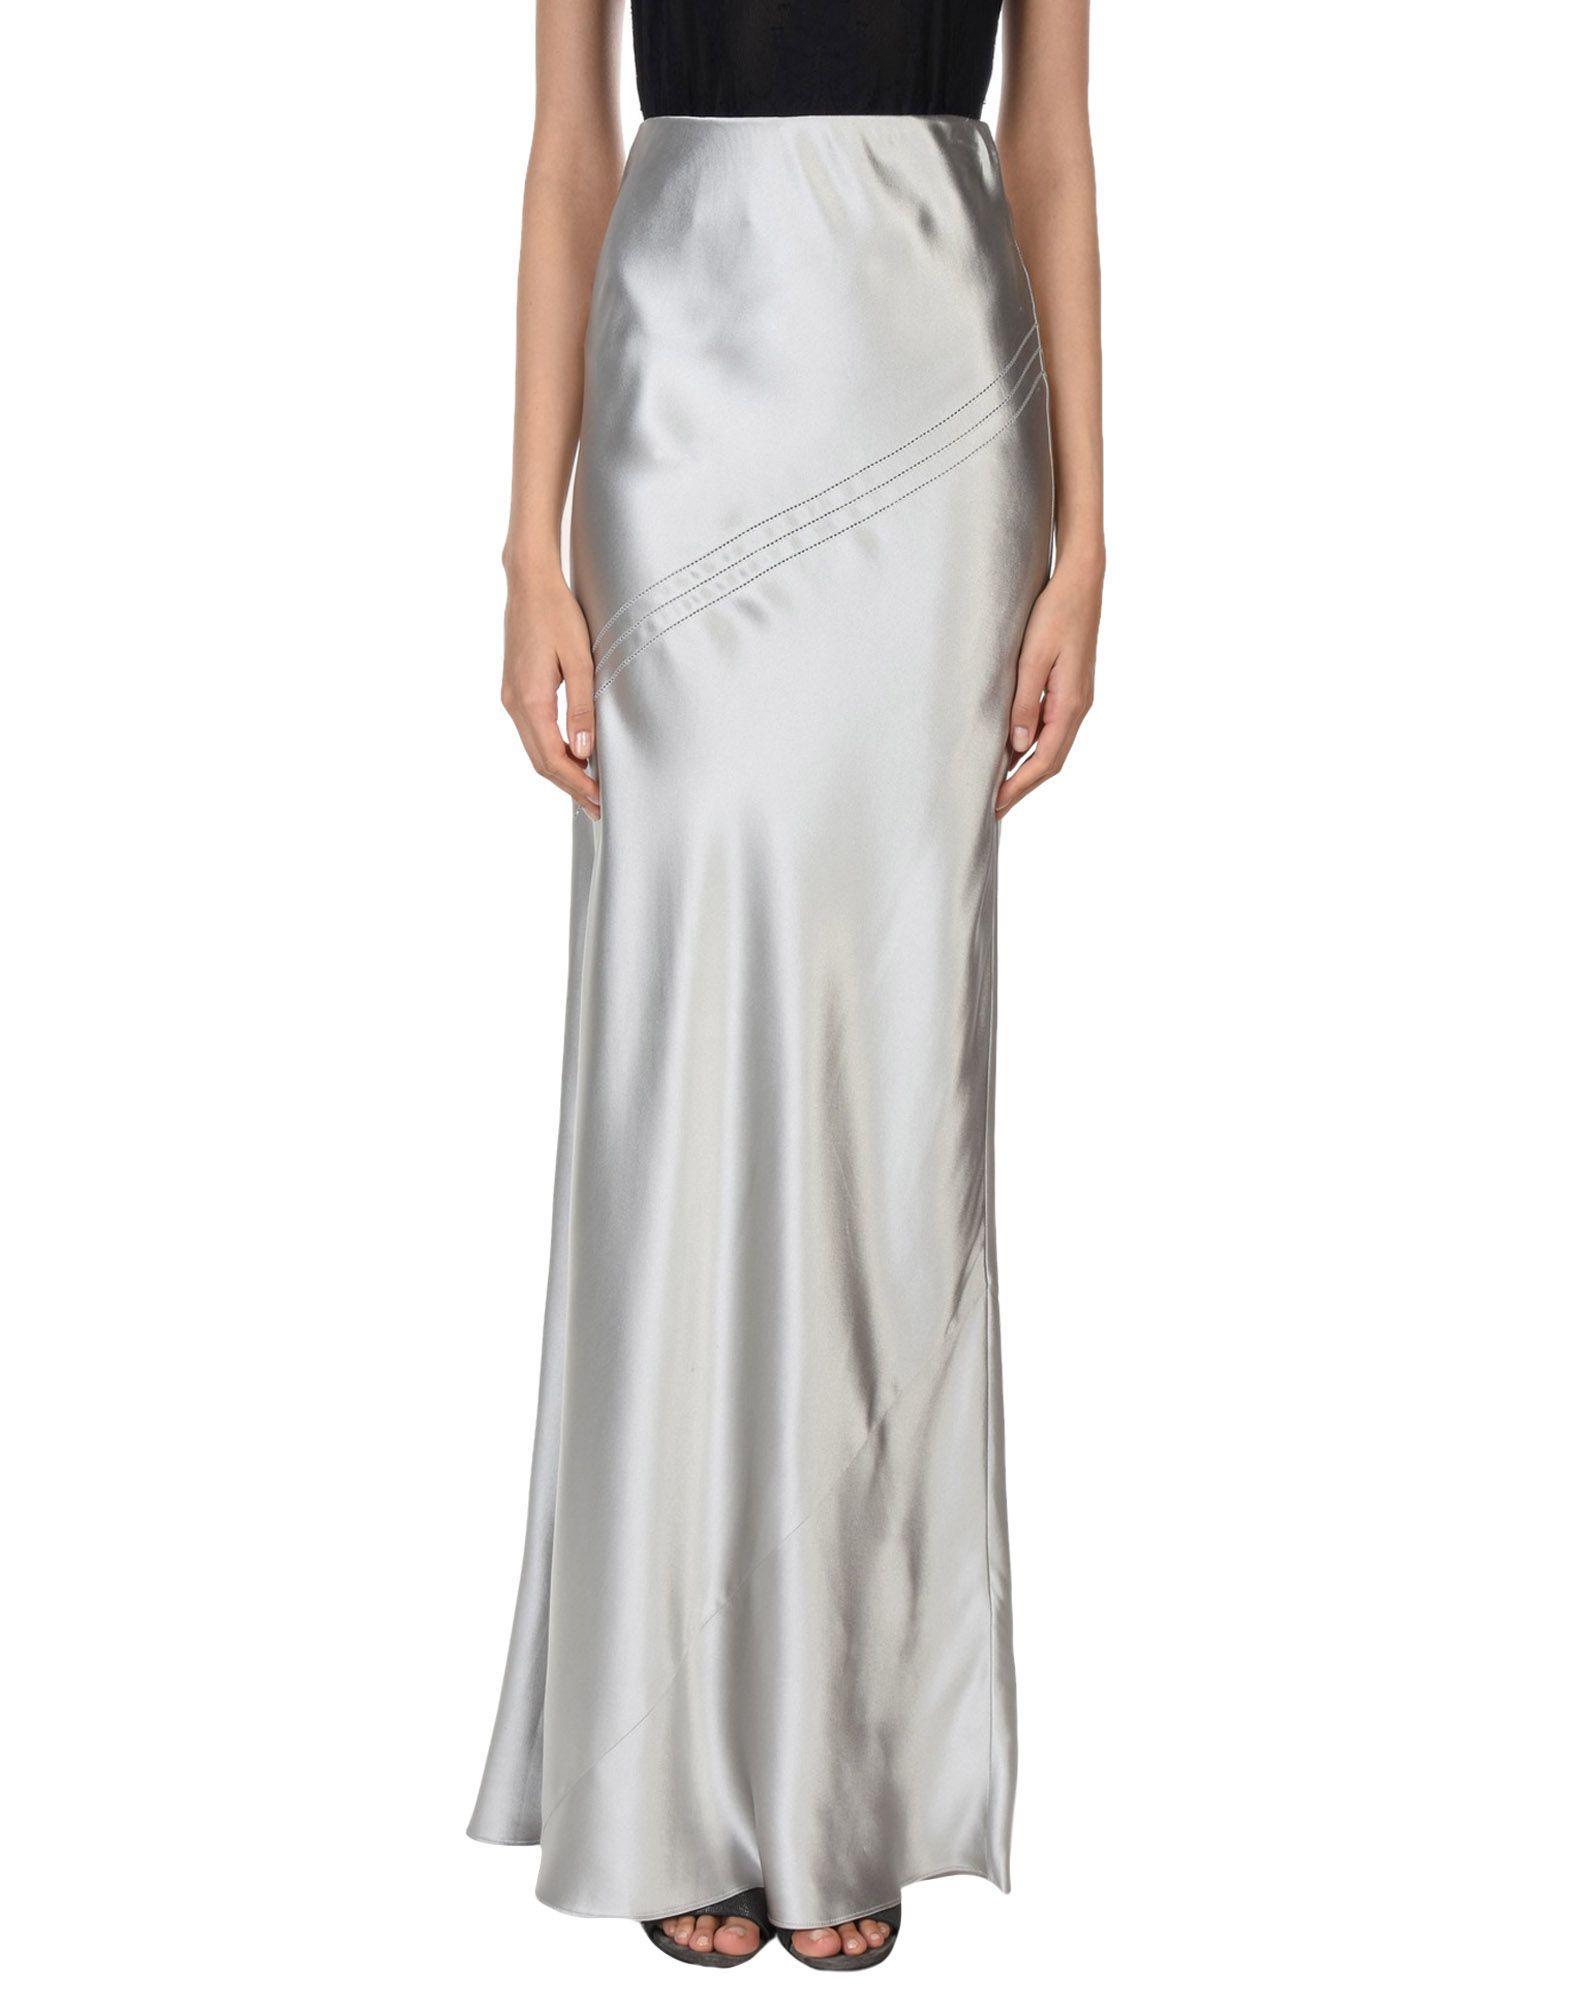 Amanda Wakeley Long Skirts In Grey